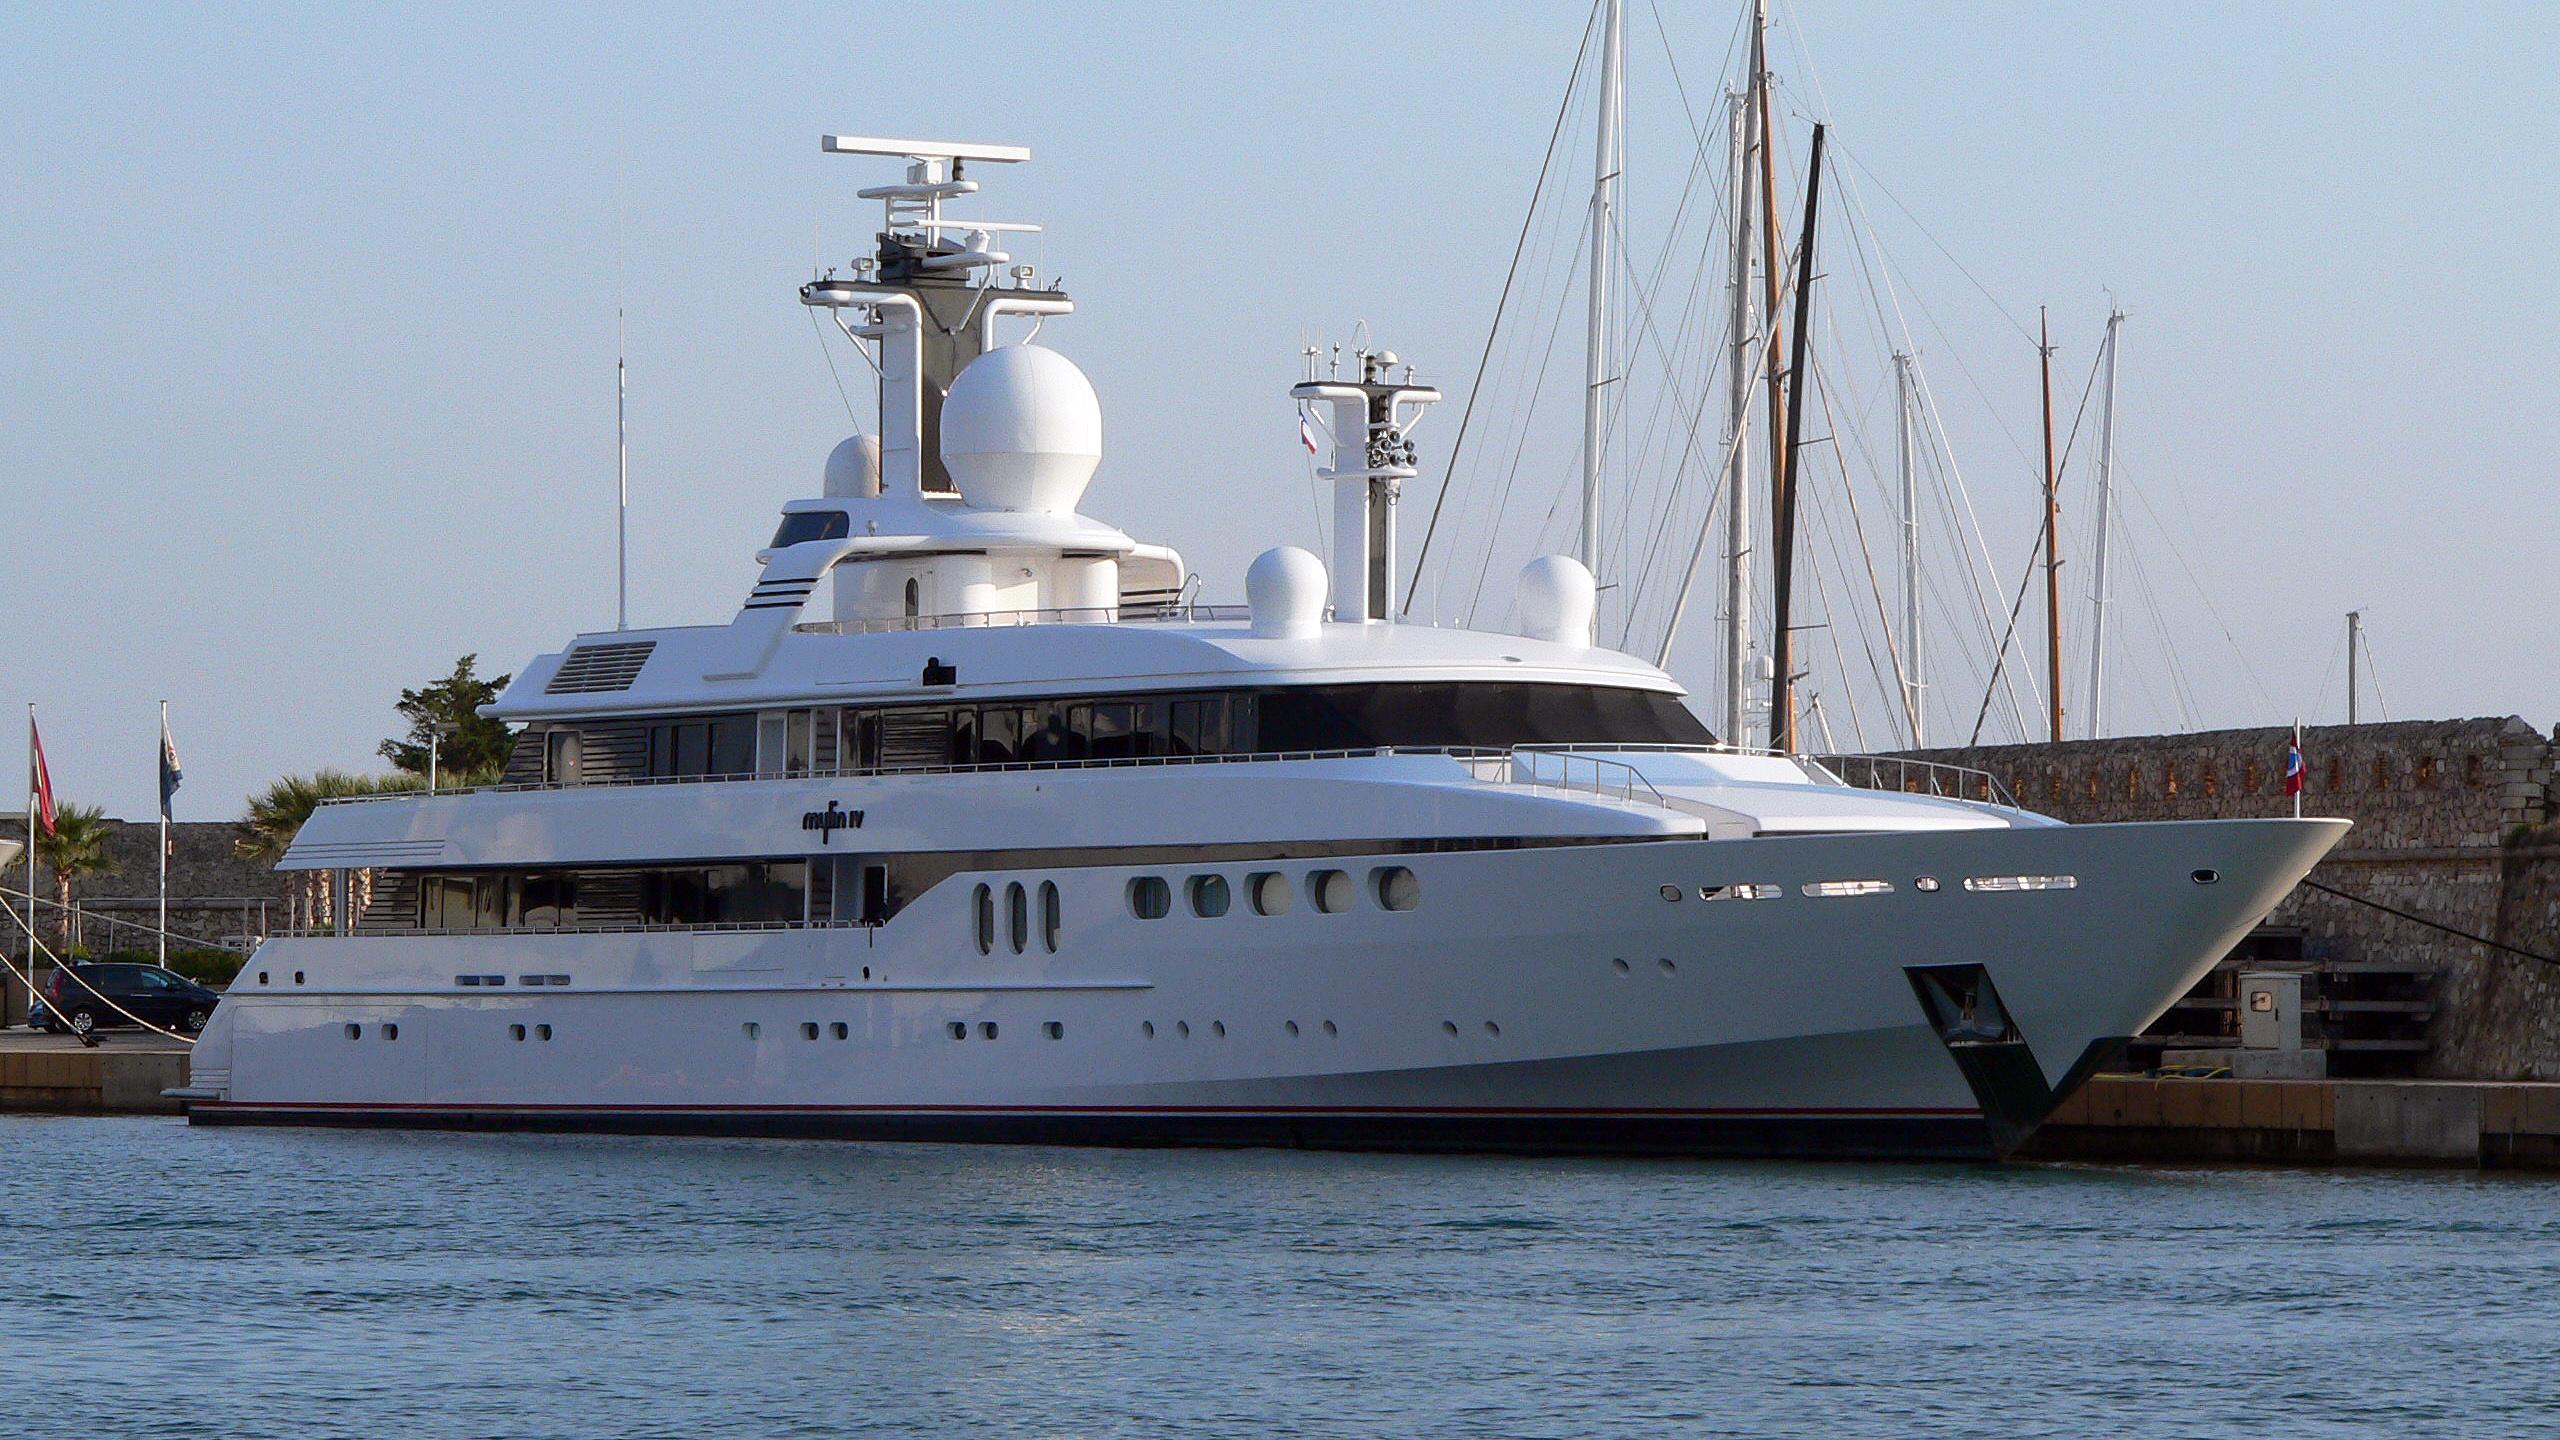 mylin-iv-half-motor-yacht-1992-61m-profile-before-refit